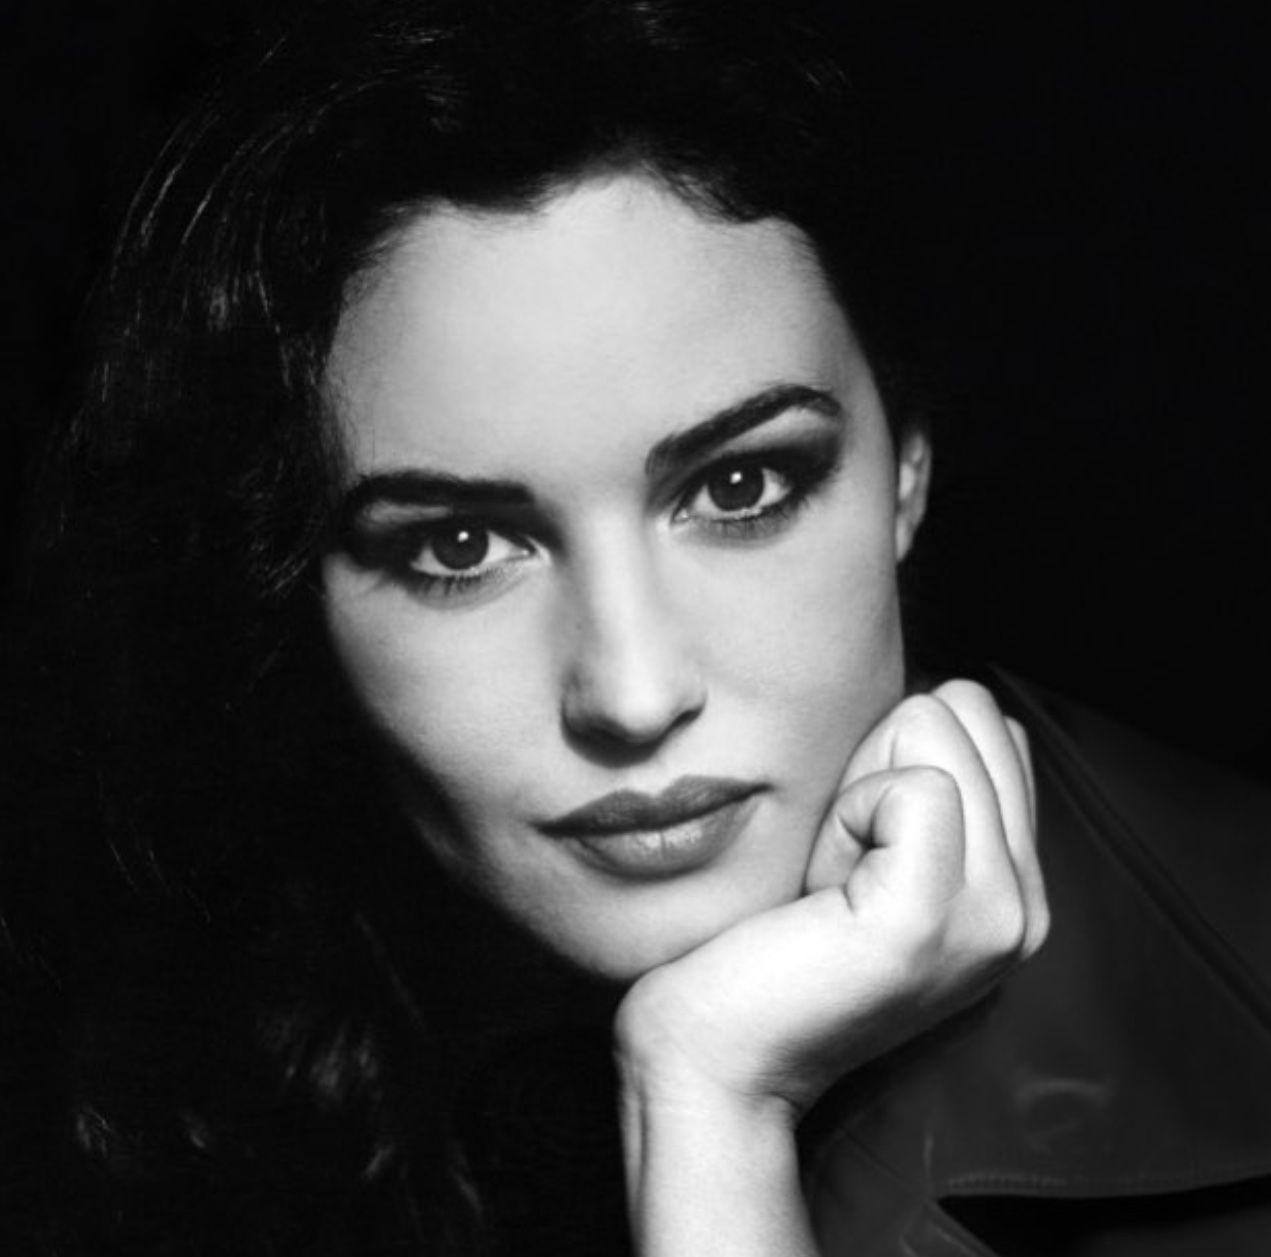 italyanskie-nekrasivie-aktrisi